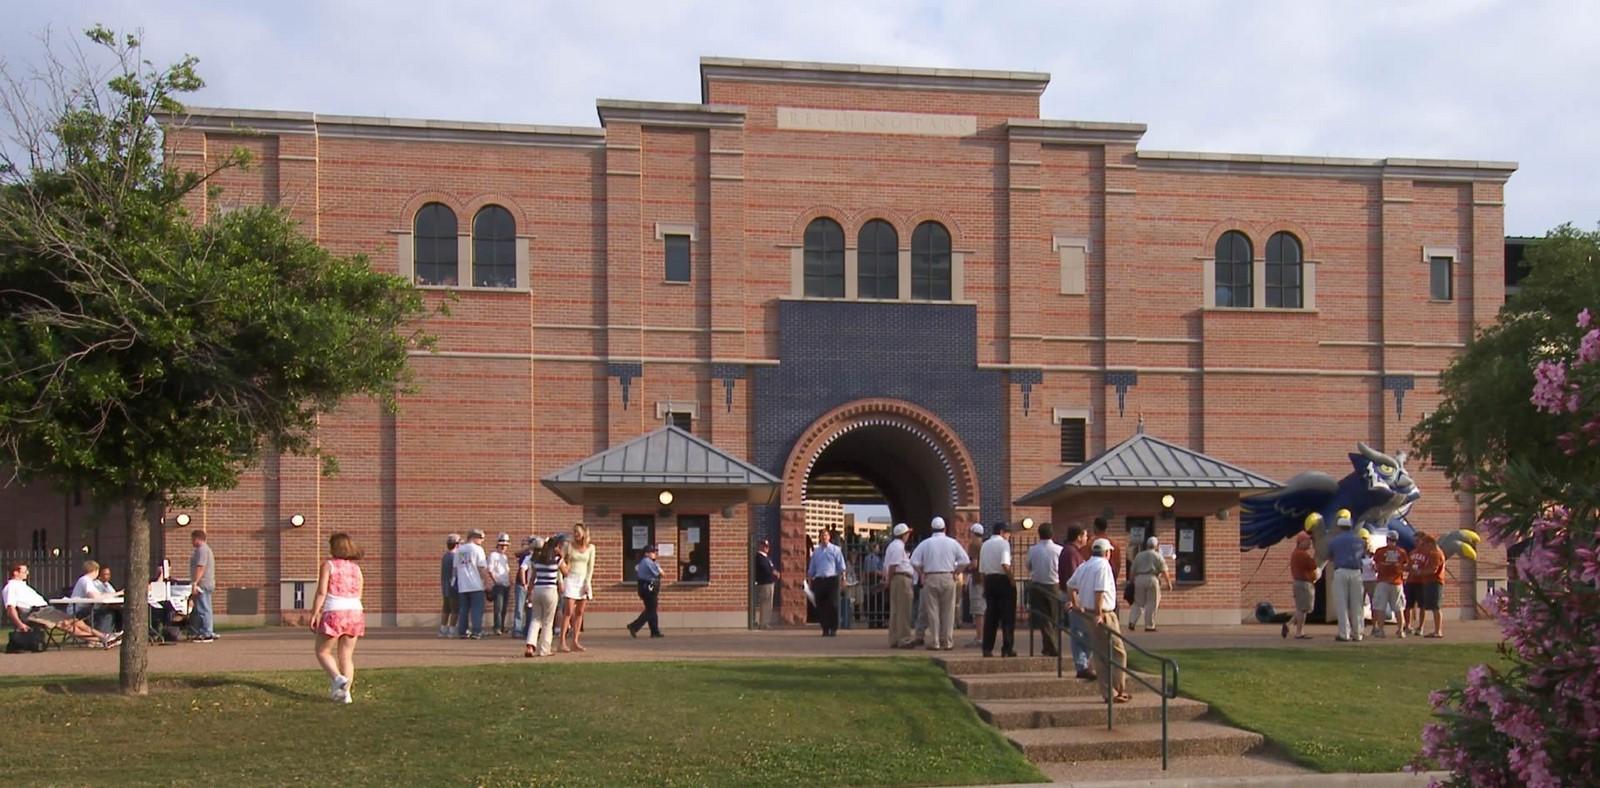 Rice University Reckling Park Baseball Stadium - Sheet2